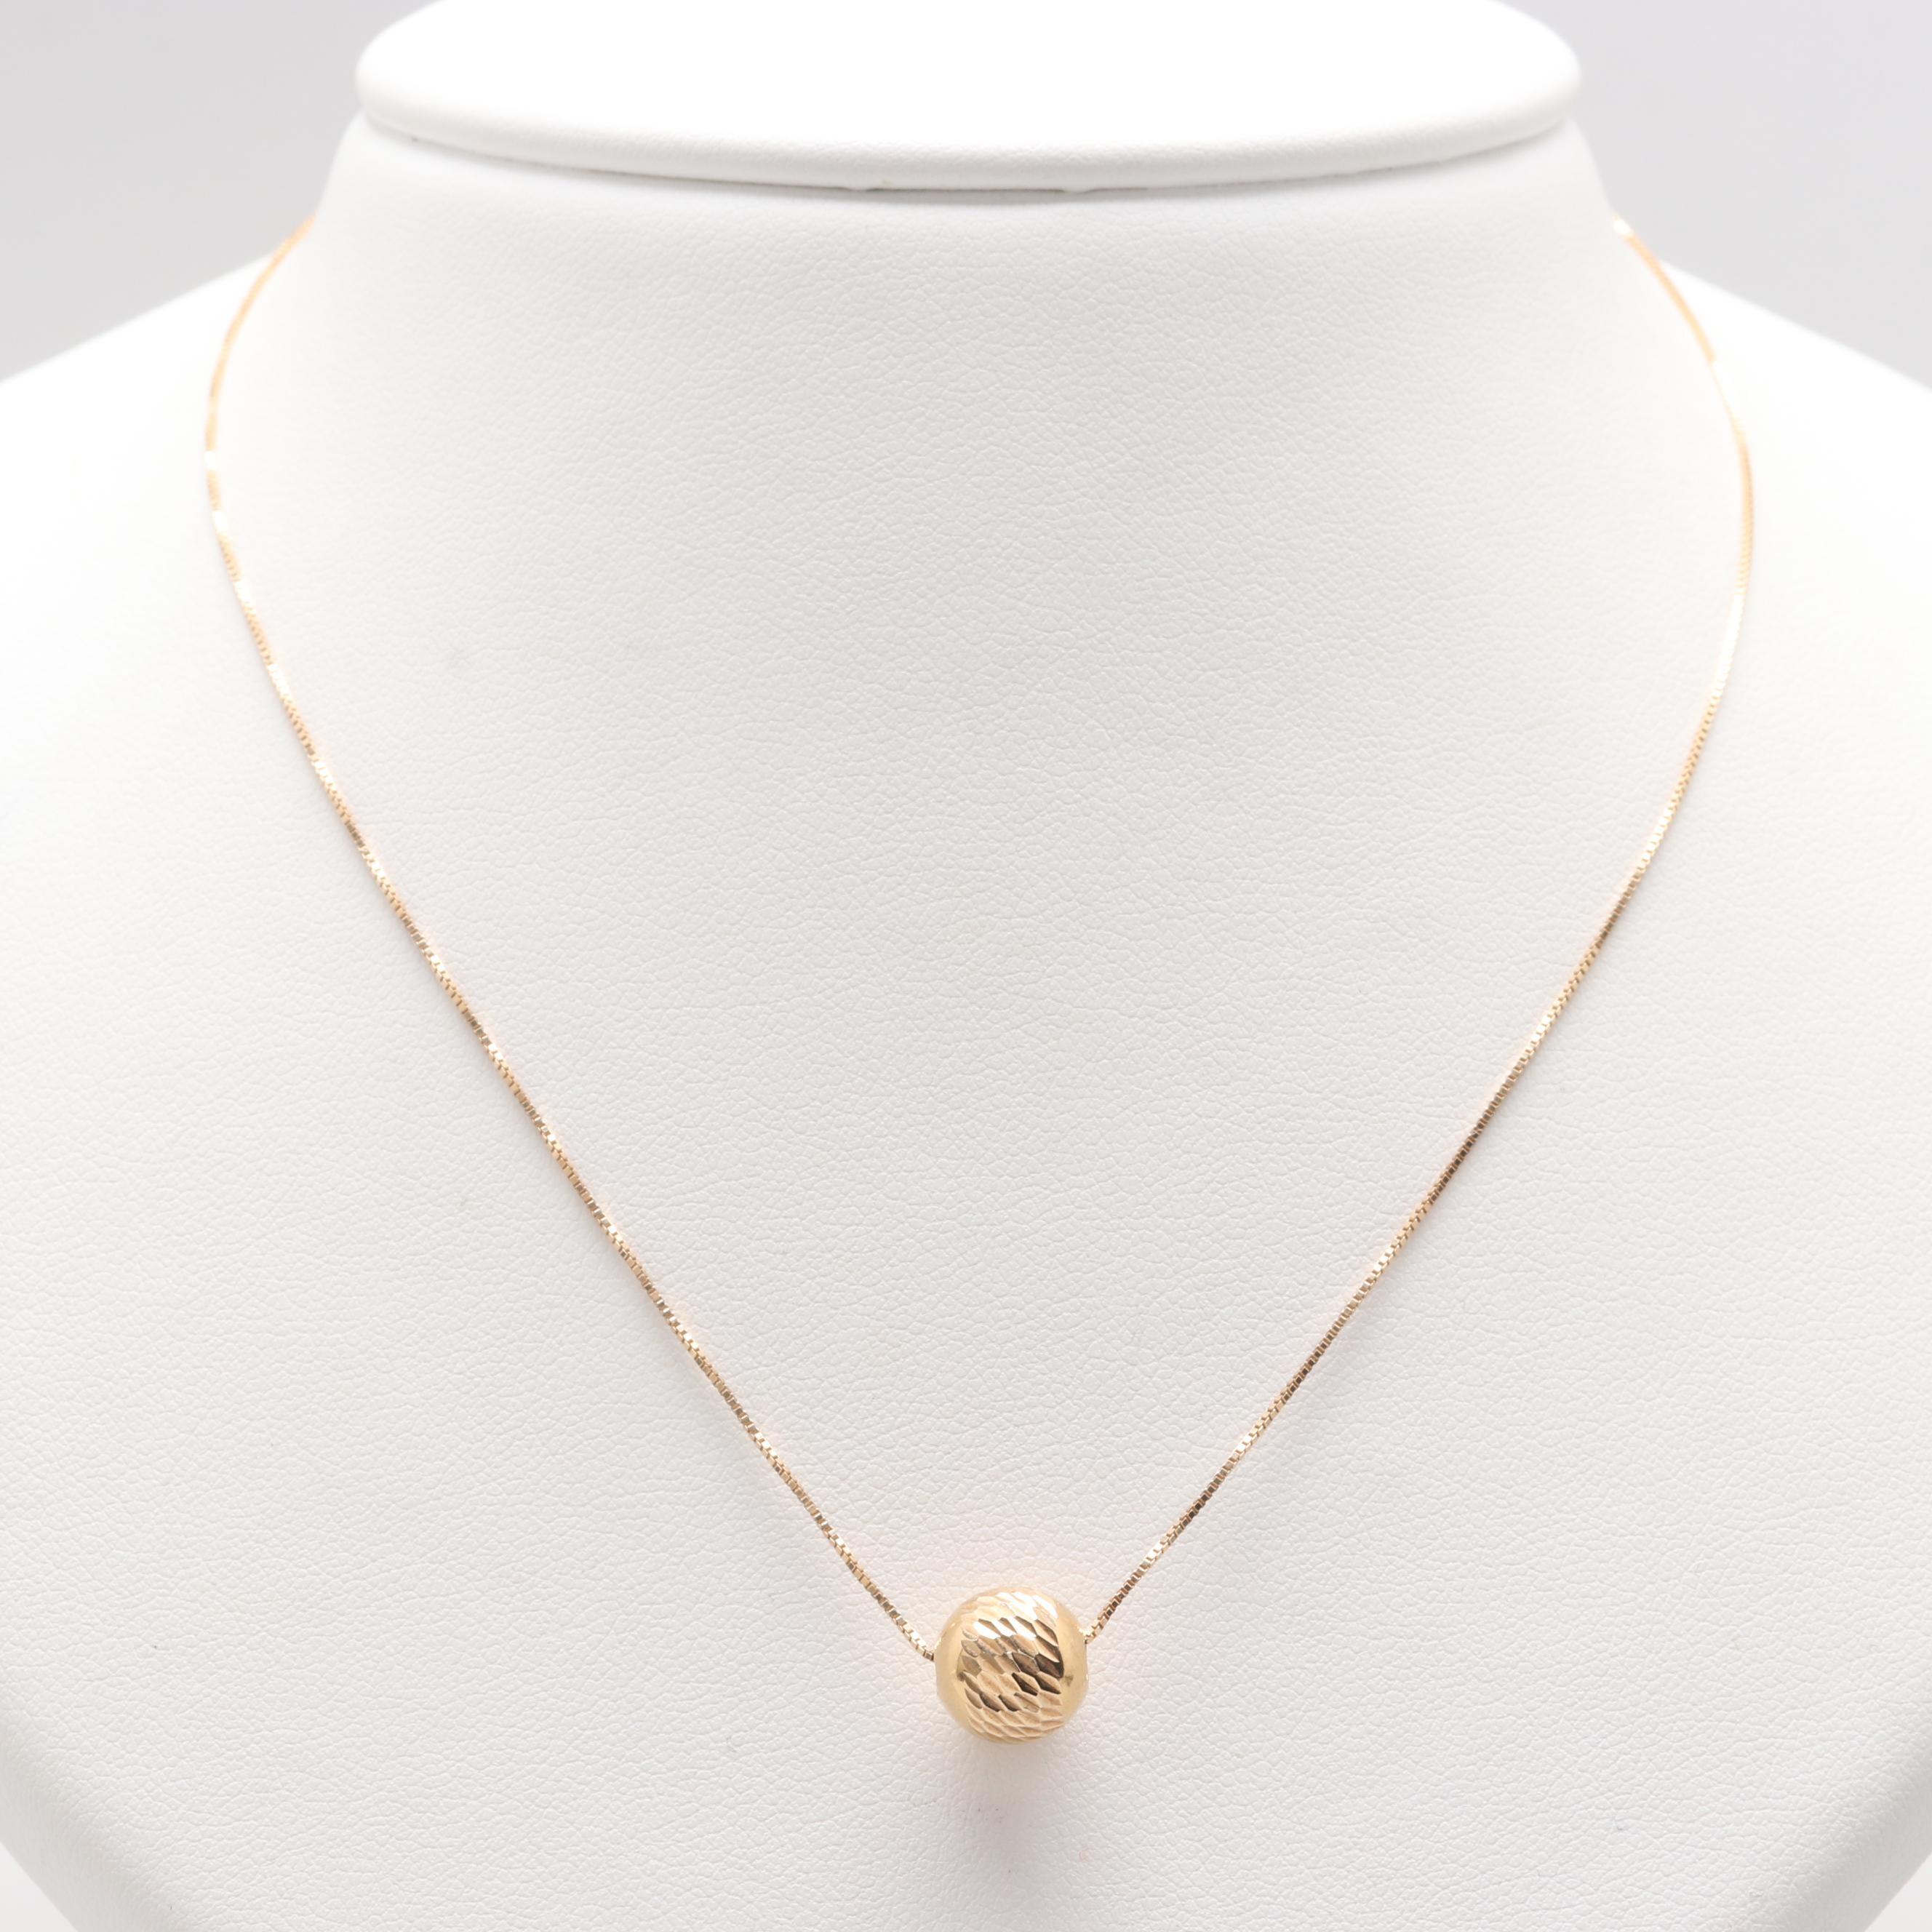 Italian 14K Yellow Gold Spherical Pendant Necklace